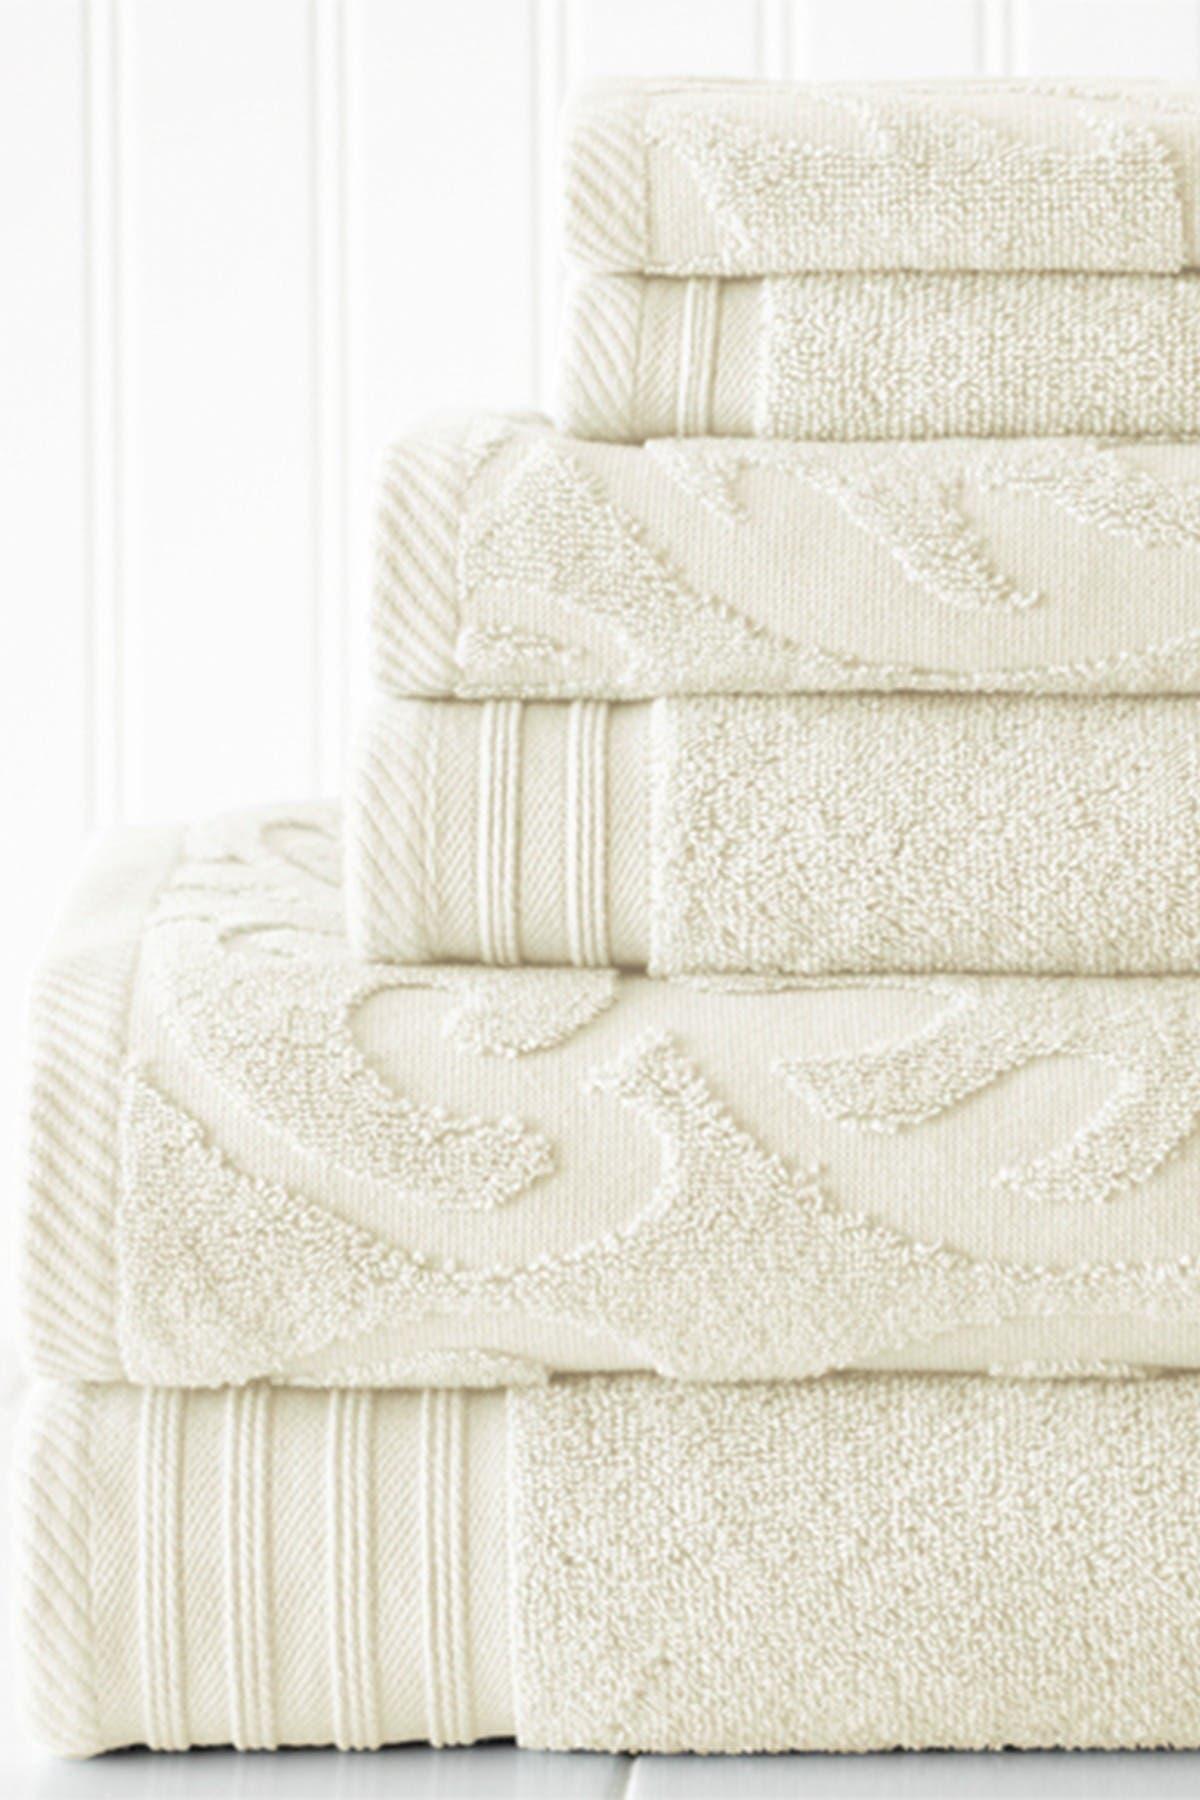 Image of Modern Threads Jacquard Medallion Swirl Solid 6-Piece Towel Set - Ivory